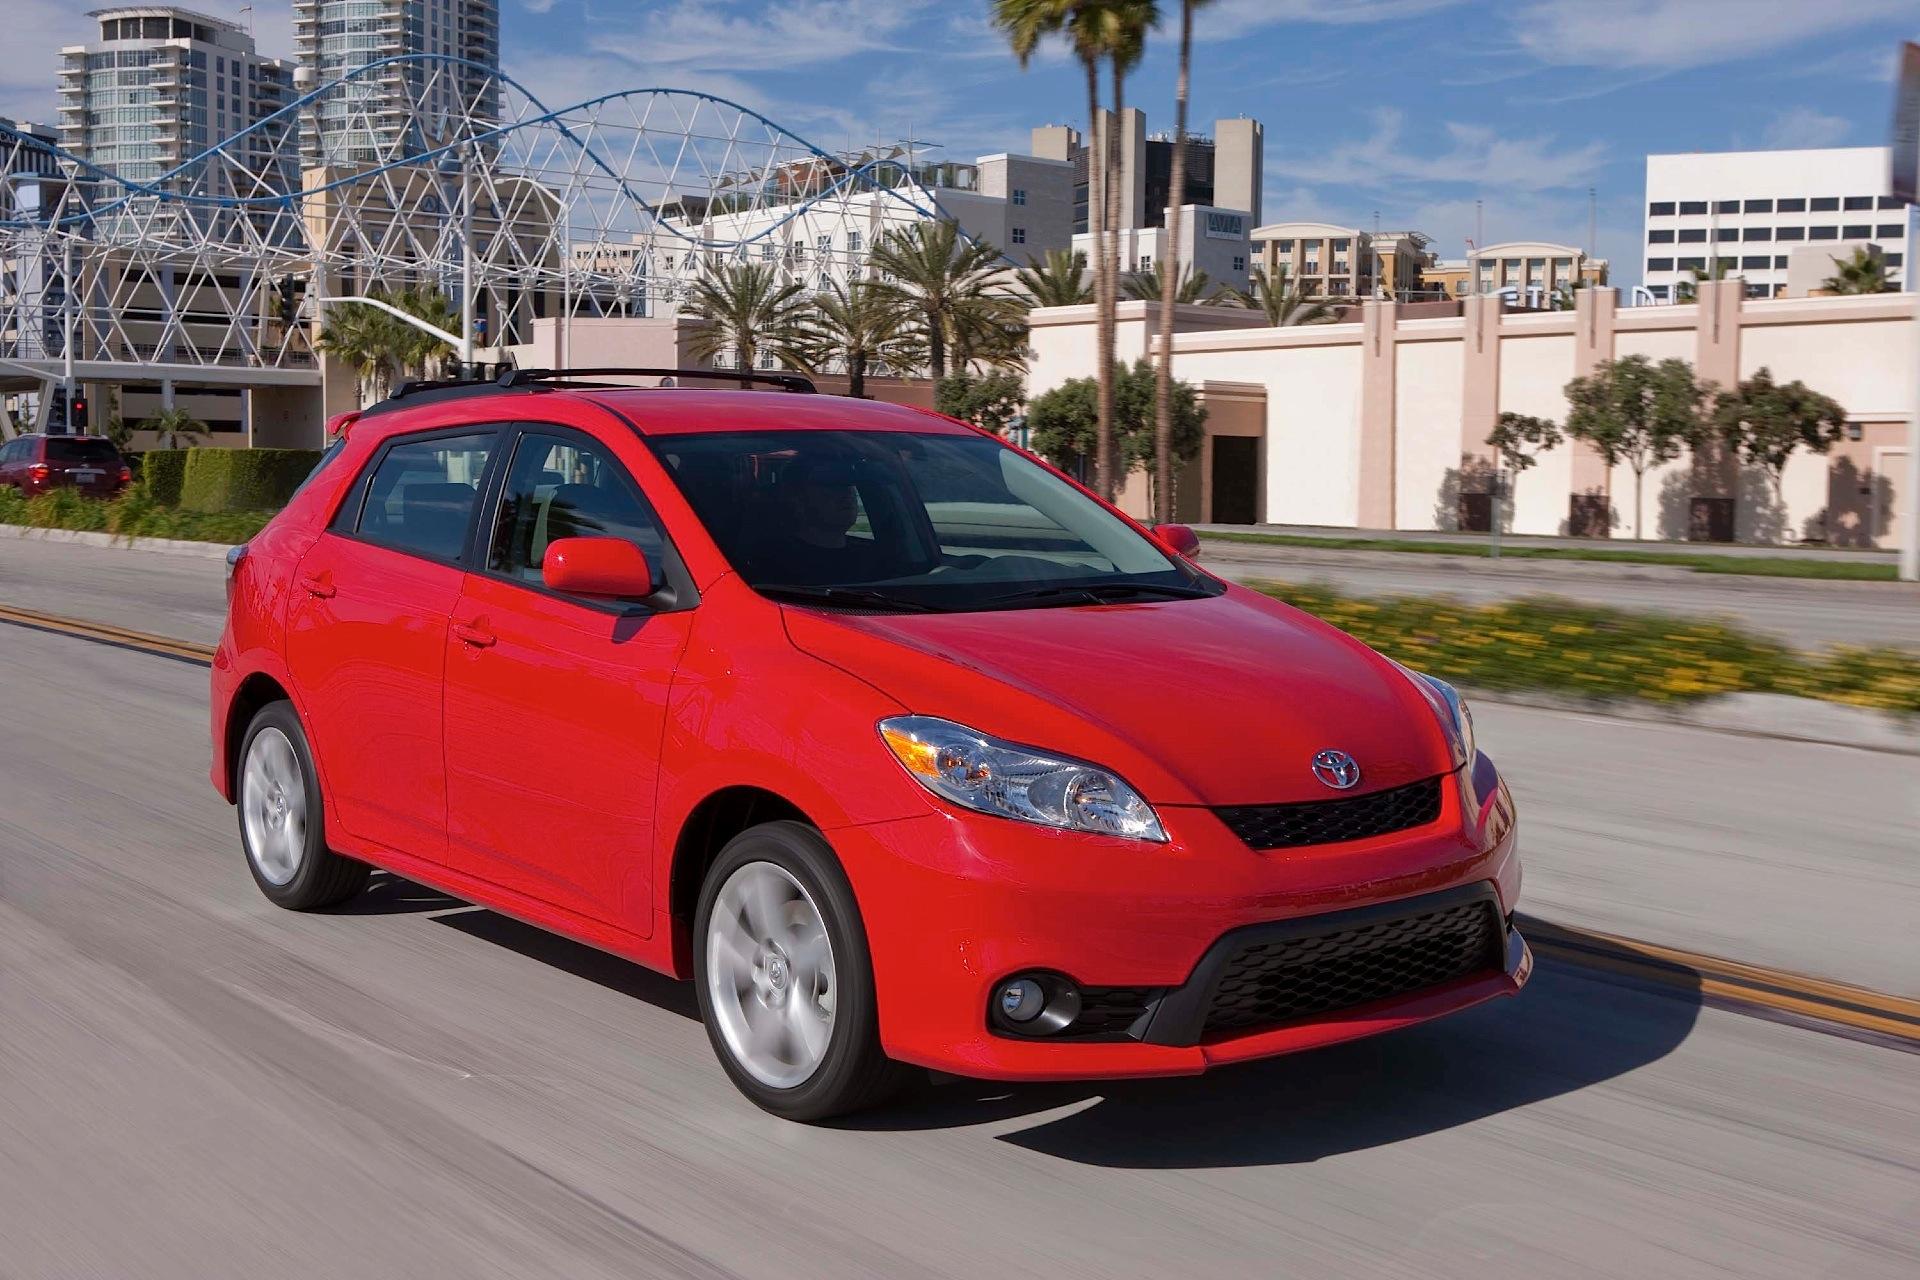 Las Vegas Car Dealerships >> TOYOTA Matrix - 2009, 2010, 2011, 2012, 2013, 2014, 2015, 2016, 2017 - autoevolution